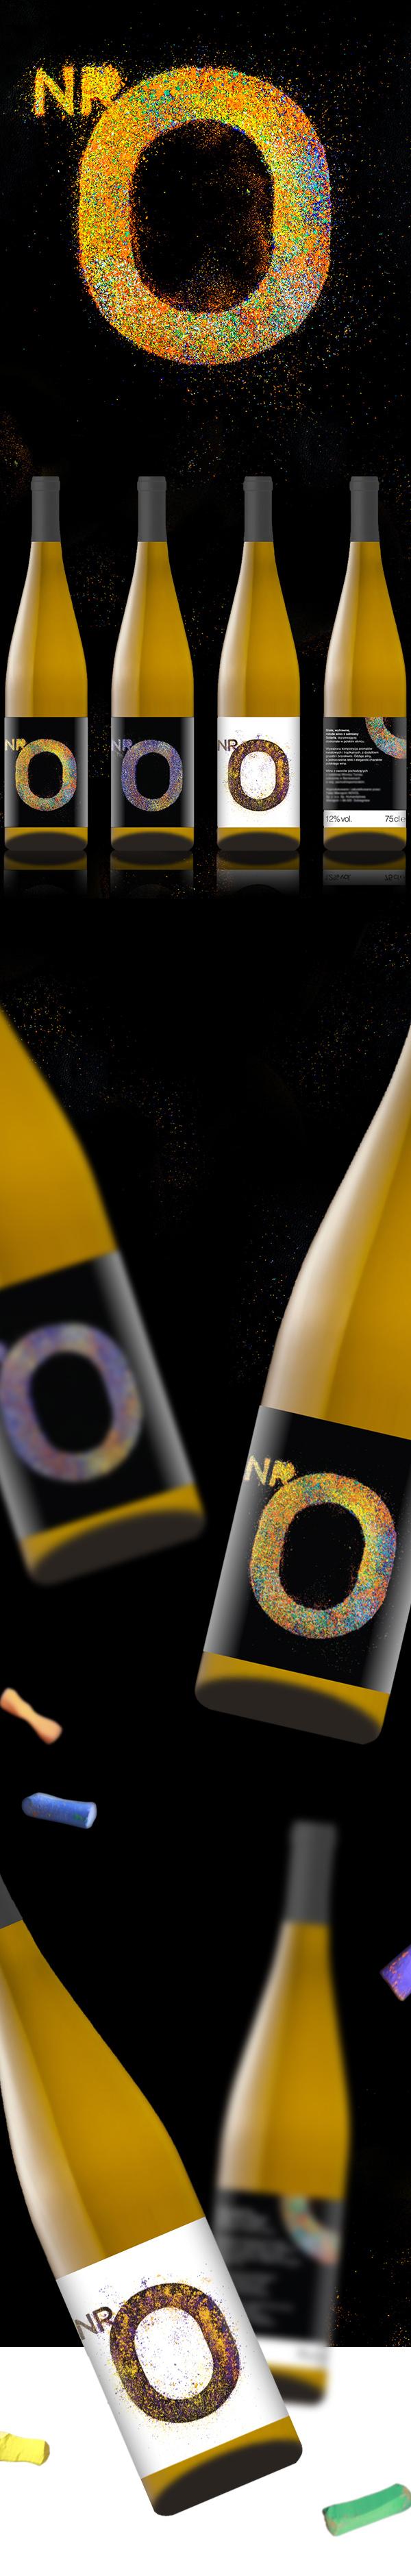 wine nr0 bottle Label wine label pastel